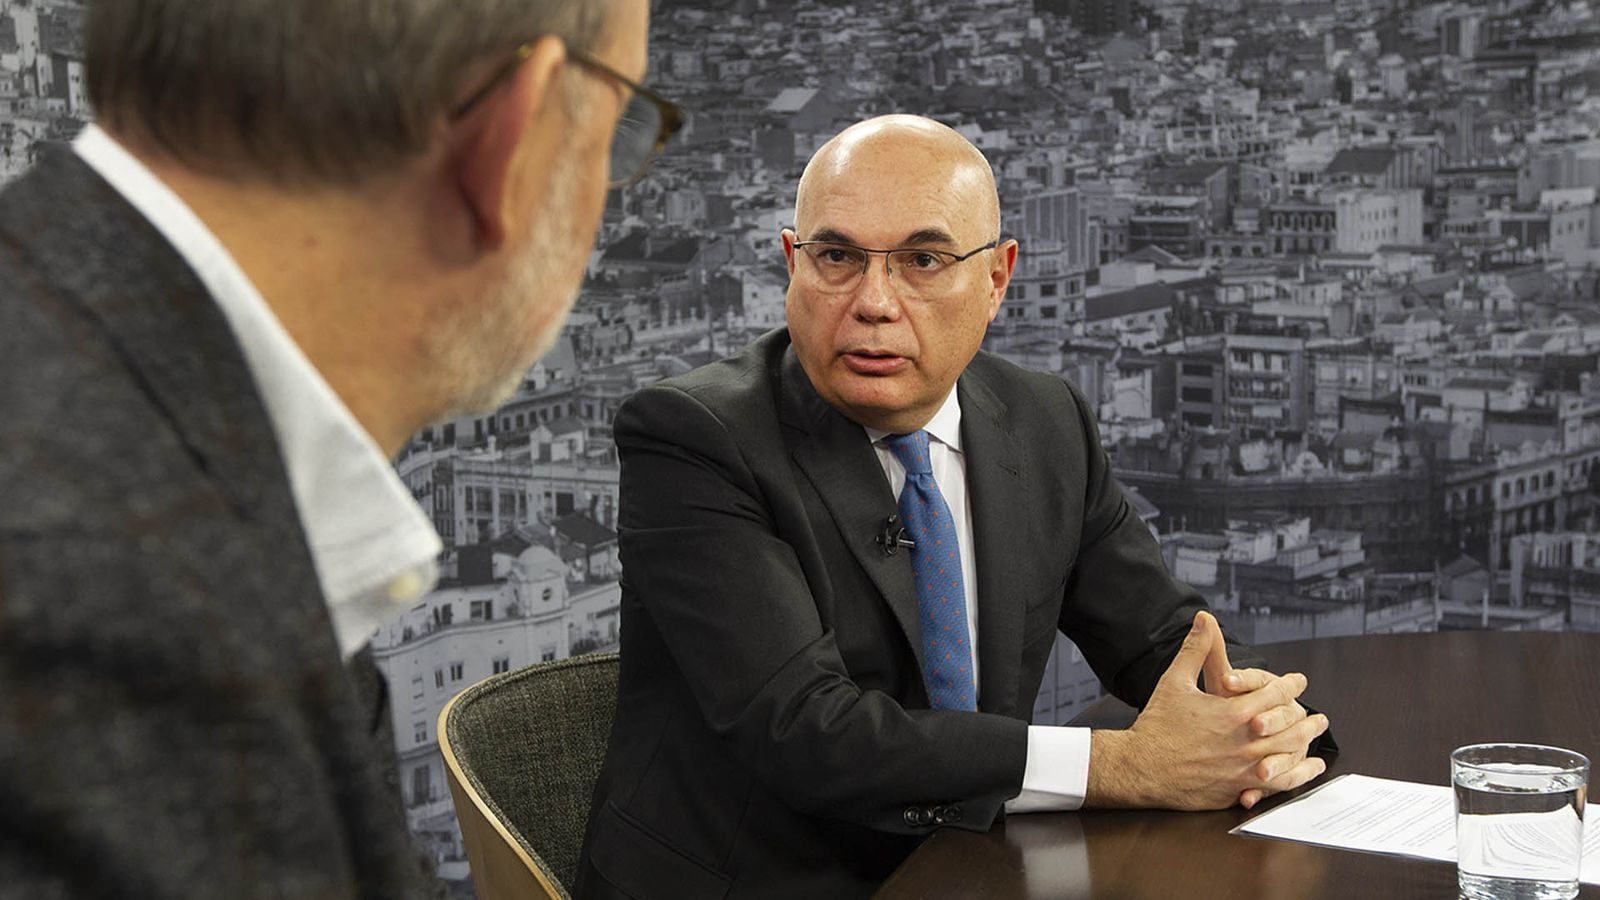 Entrevista d'Antoni Bassas al Dr. Josep Tabernero